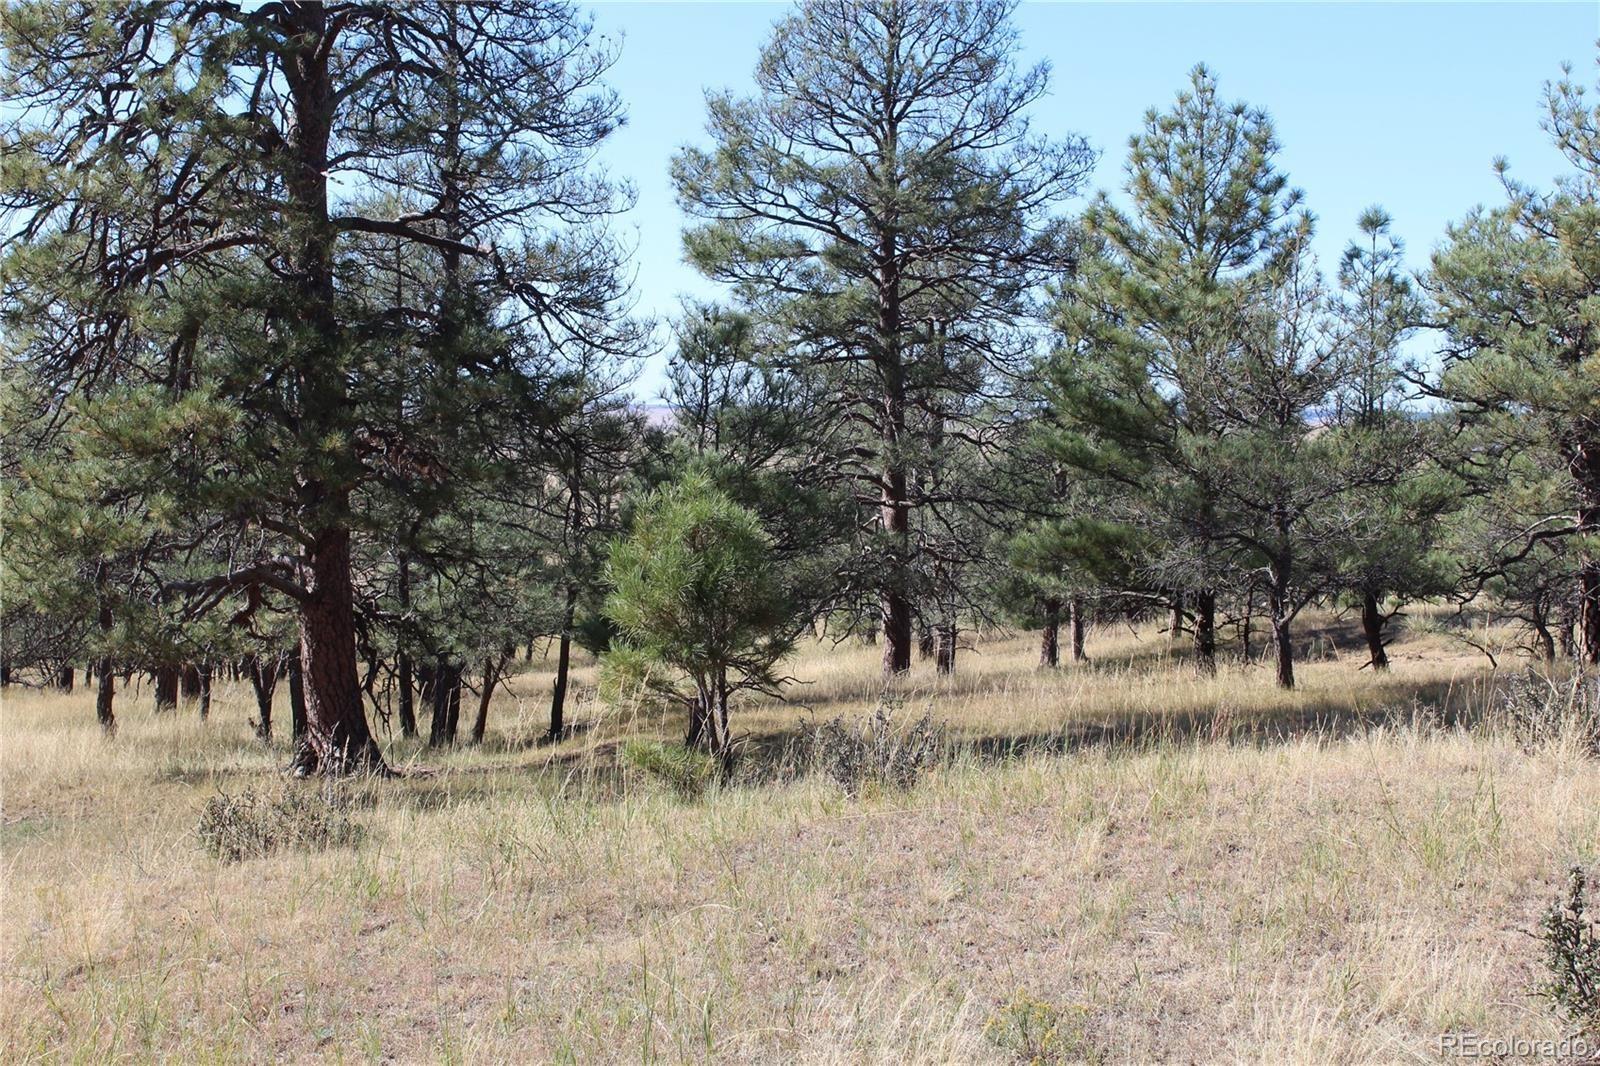 MLS# 2877174 - 5 - Cattle Circle, Kiowa, CO 80117